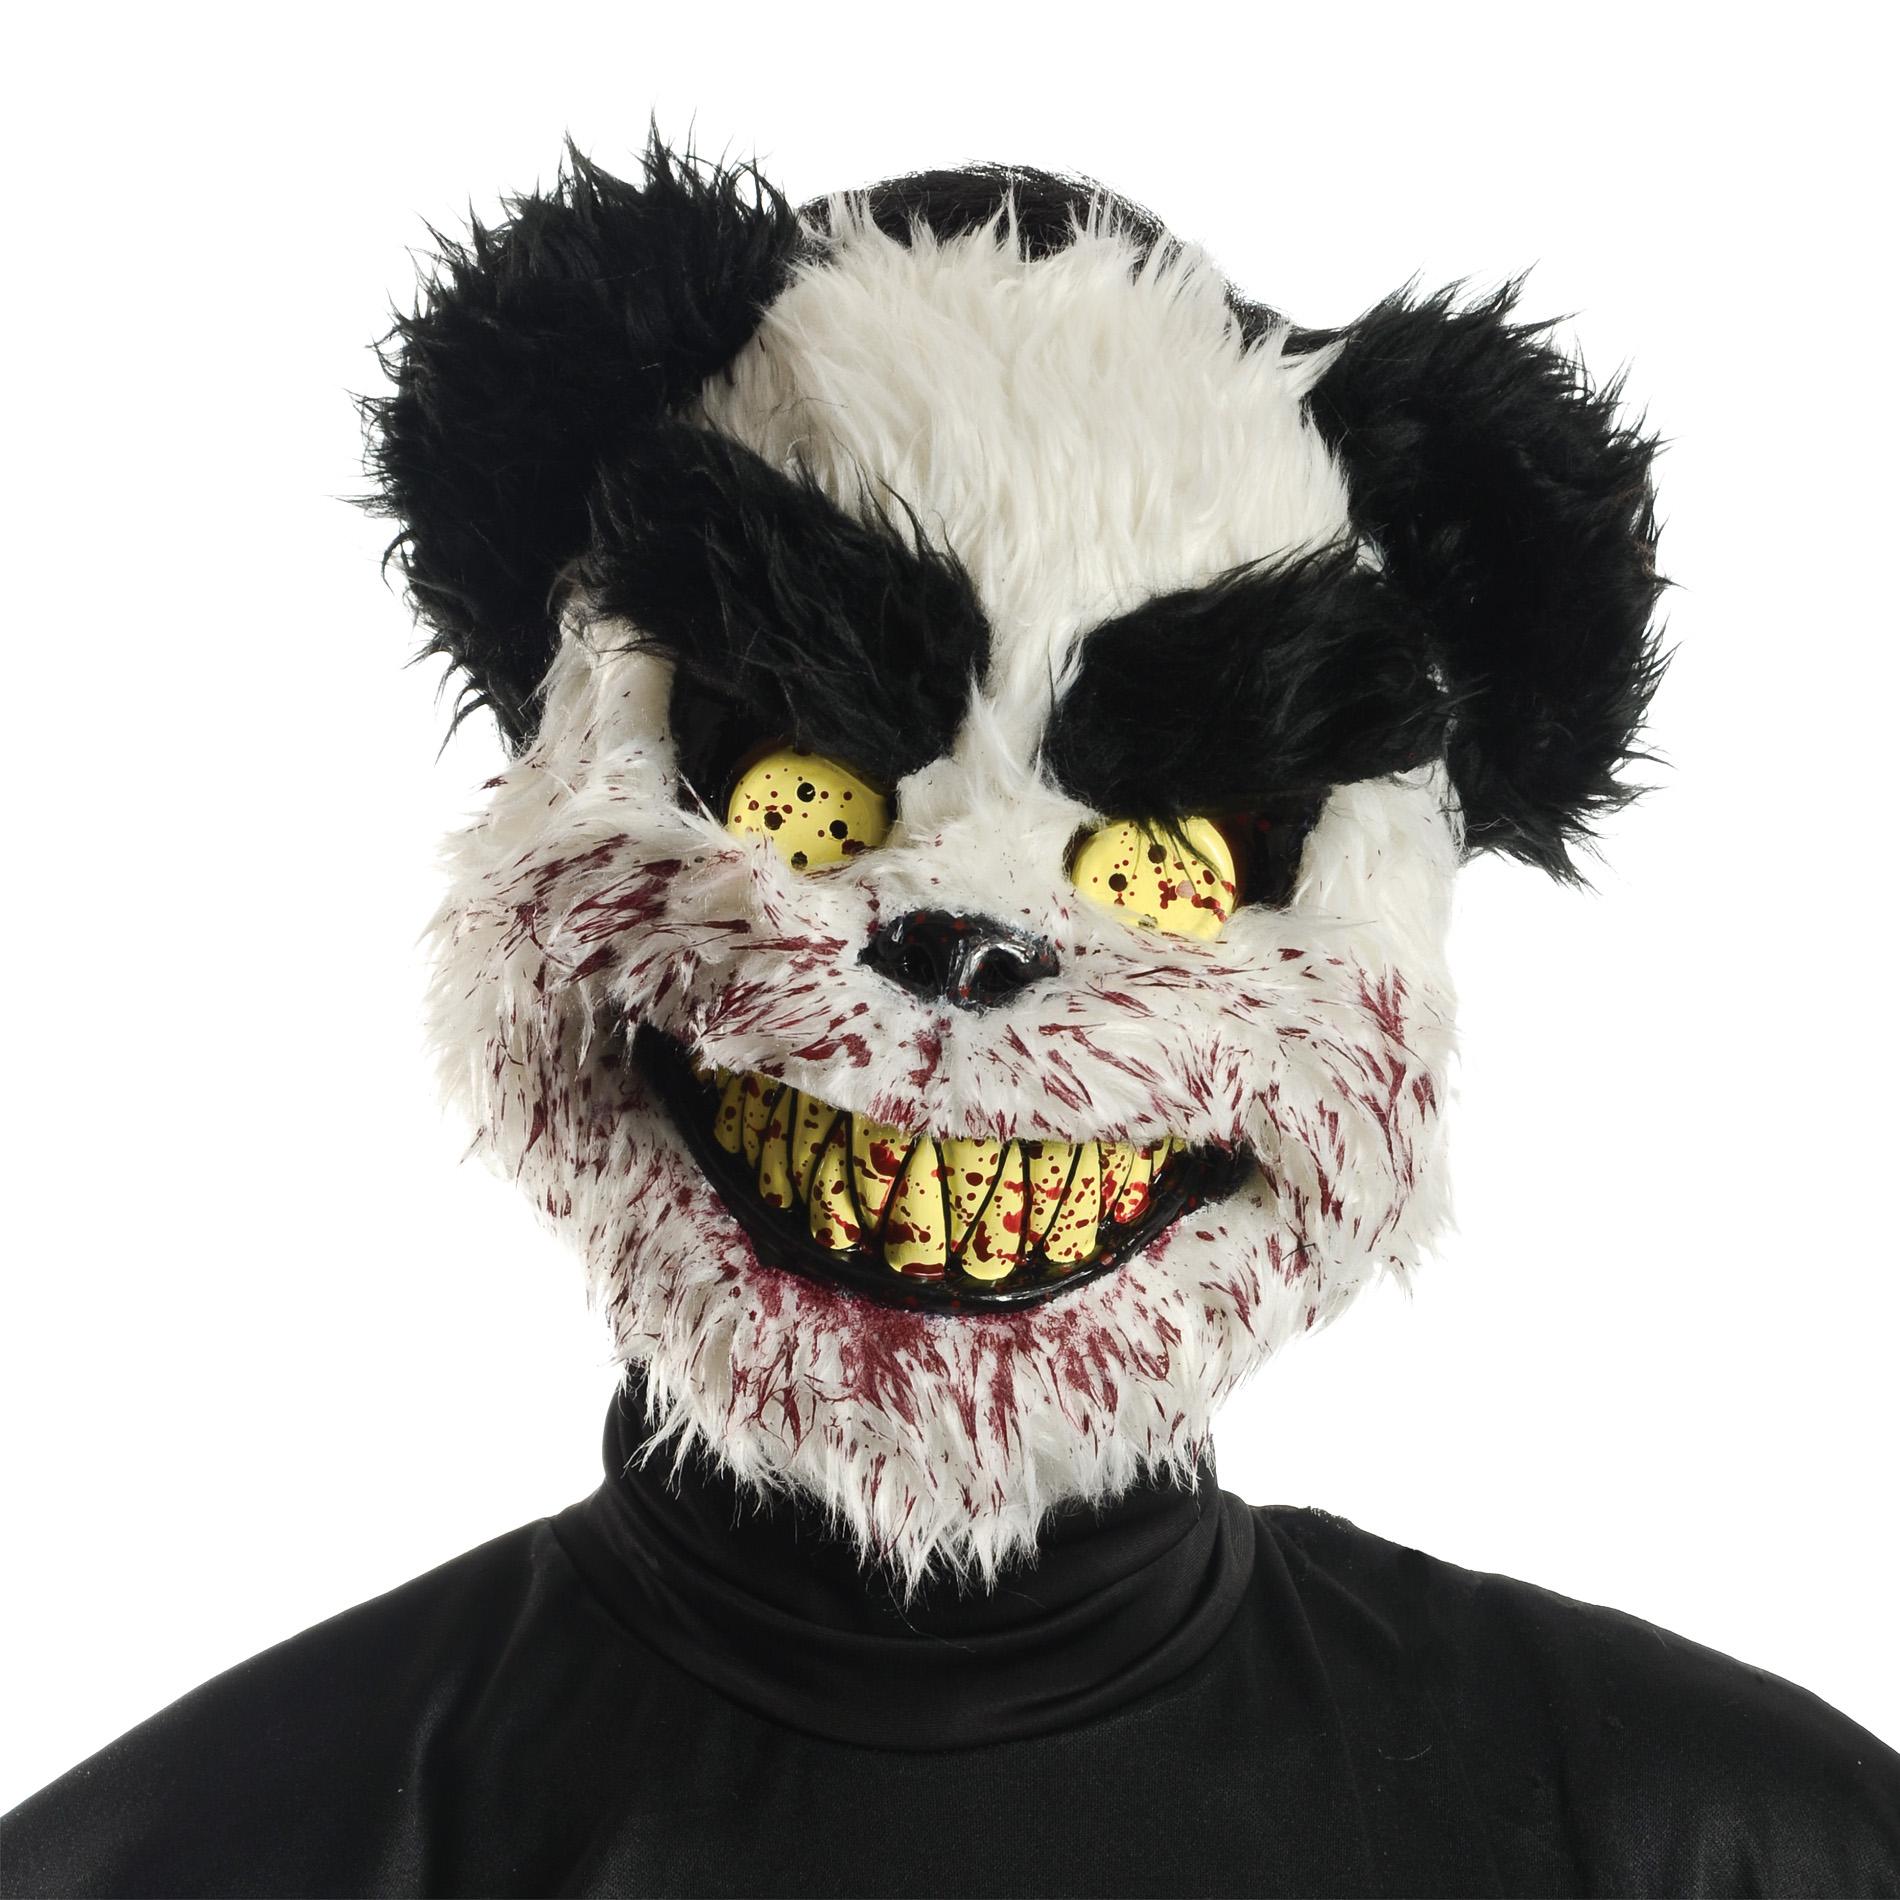 Roblox Promo Code Bear Face Mask - Exploring Mars